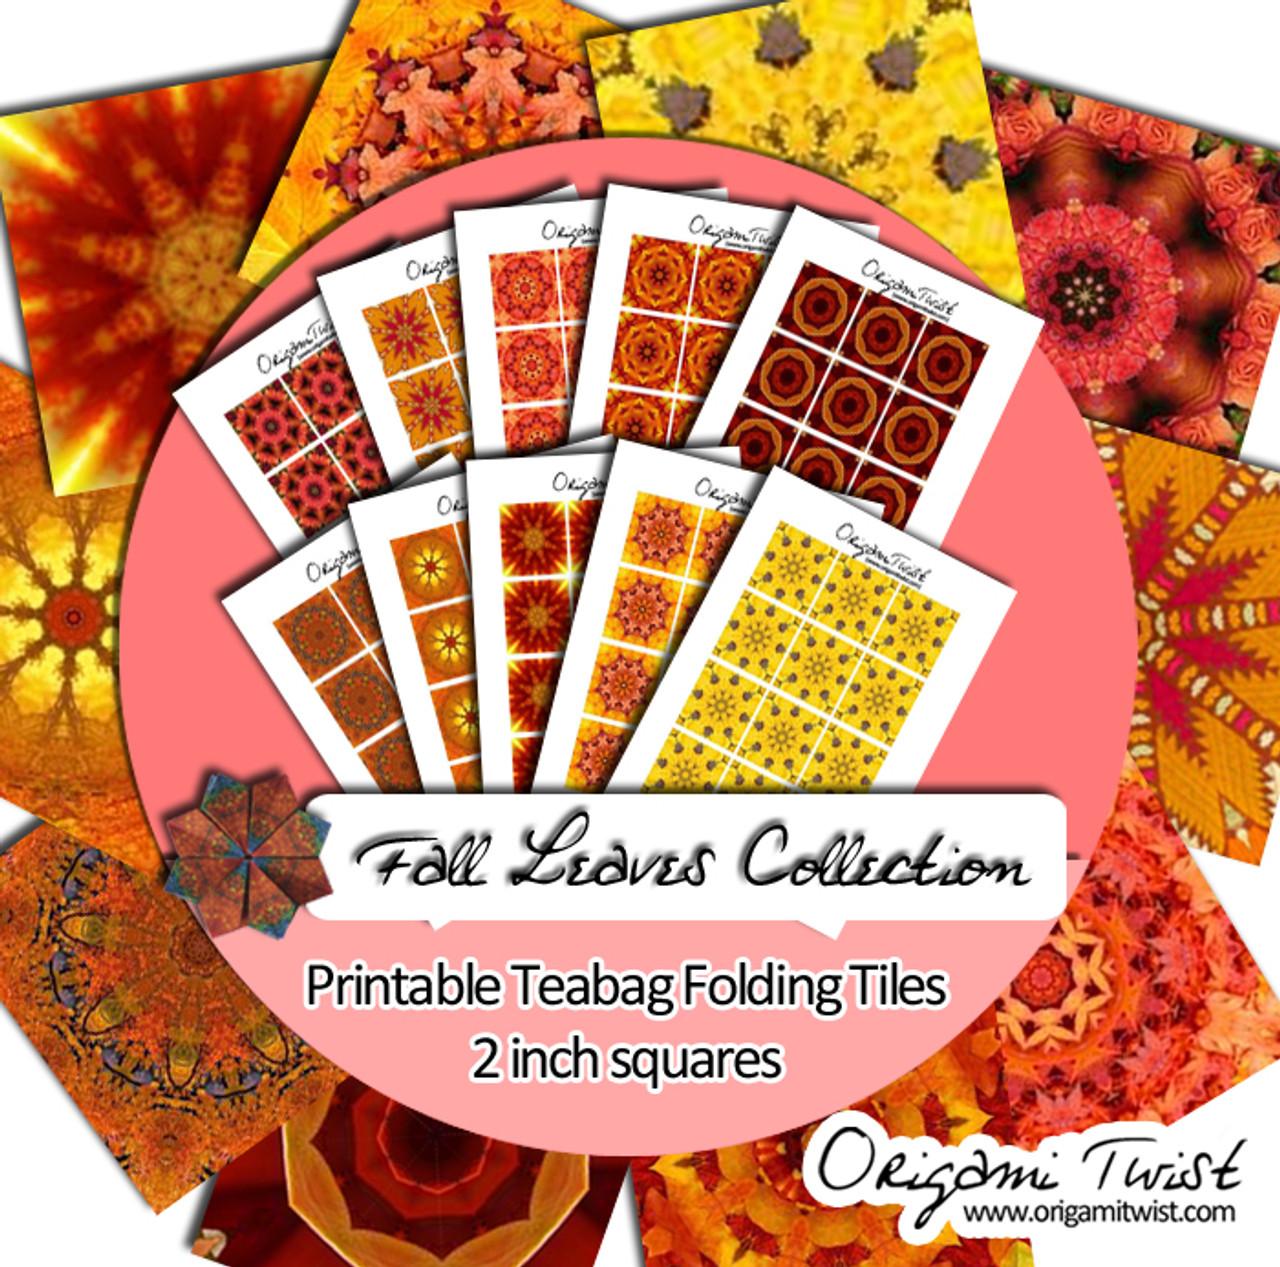 Fall Leaves Printable Teabag Folding Tiles 10 Page Collection